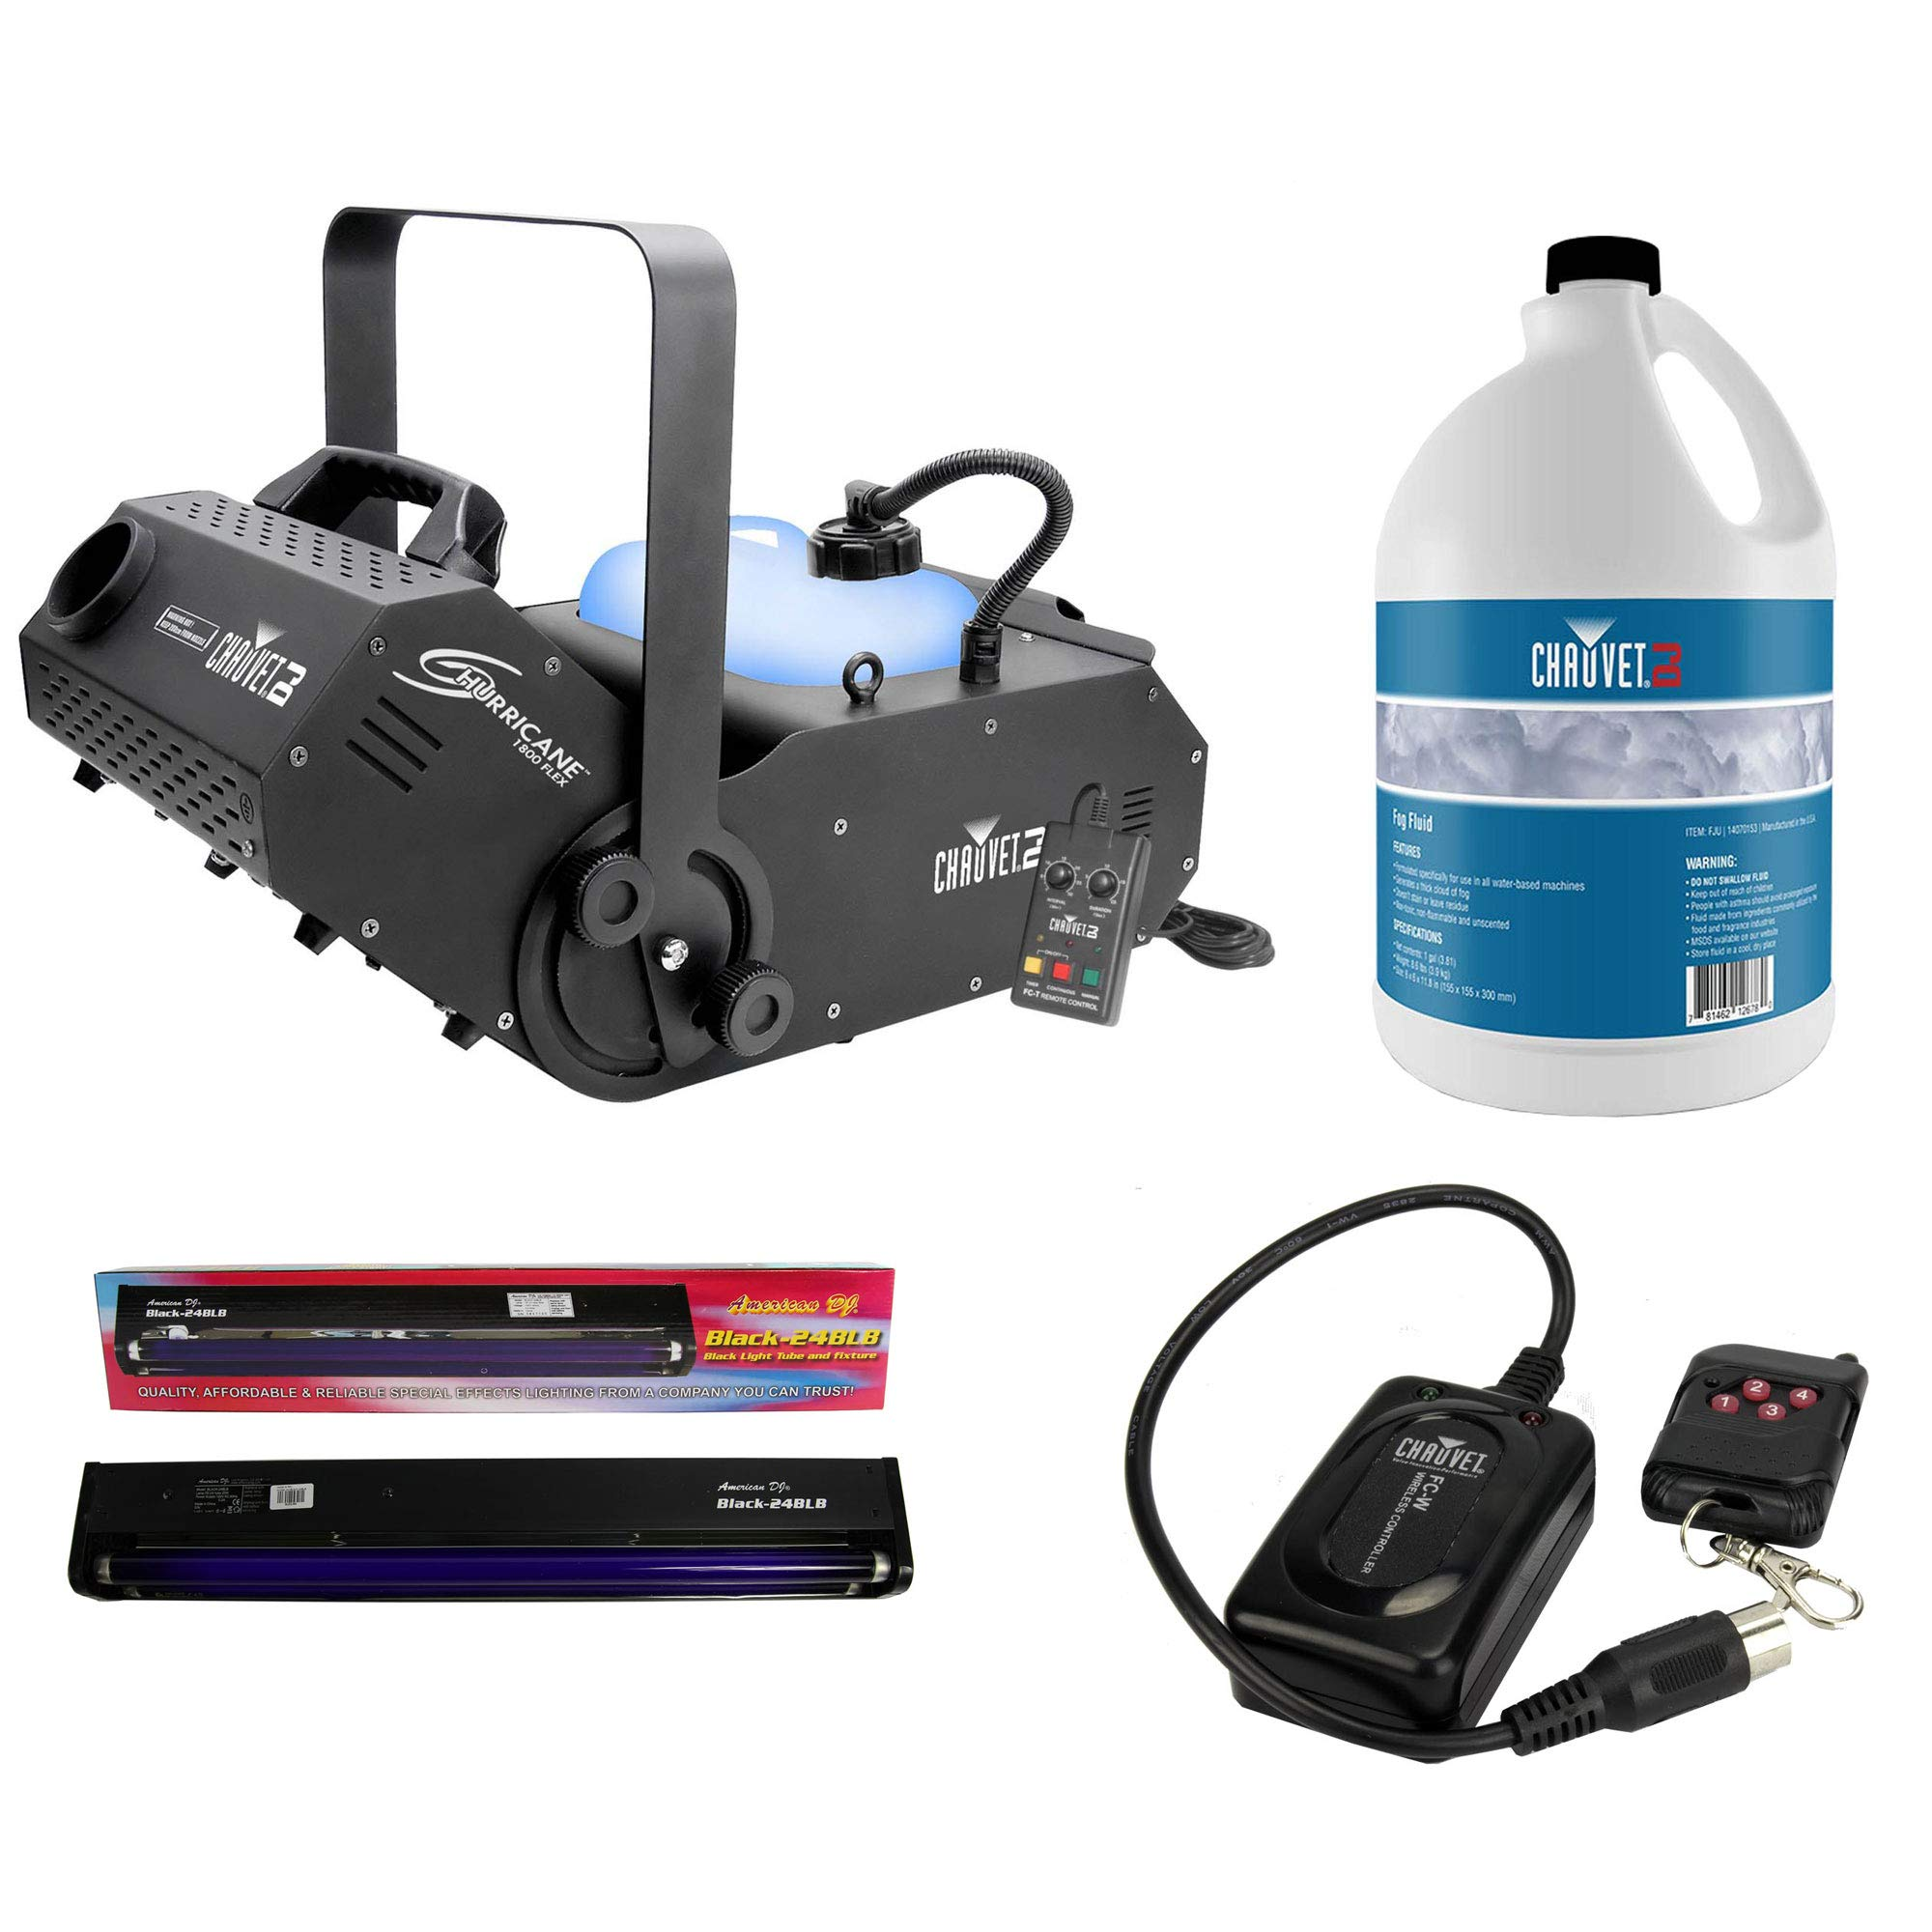 Chauvet DJ Hurricane 1800 H1800 FLEX DMX Fog/Smoke Pro Machine w/Timer Remote by ADJ Products